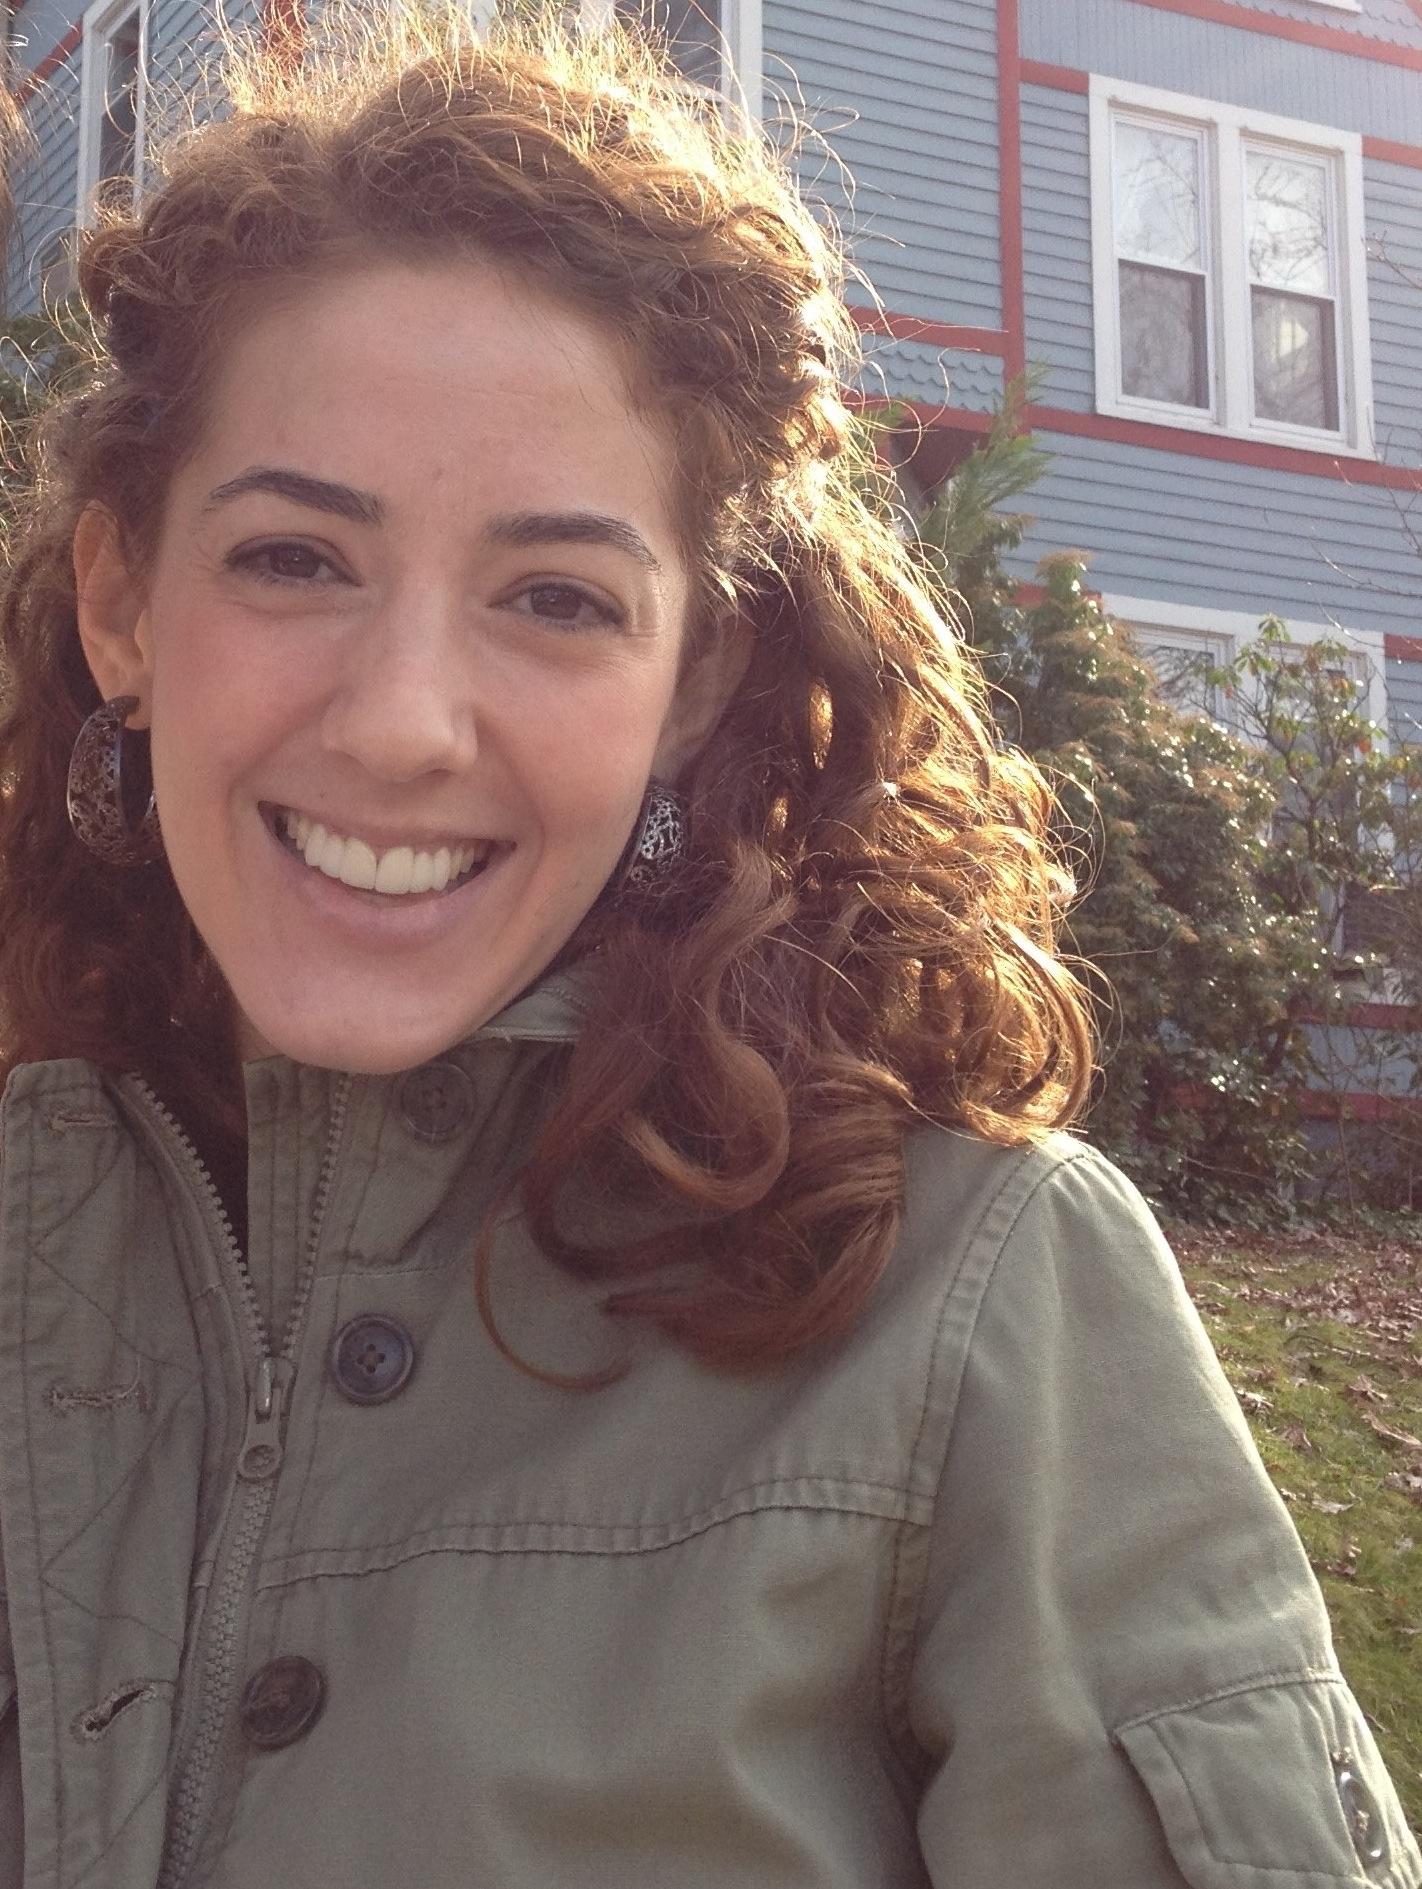 Ms. Kathryn Molinaro